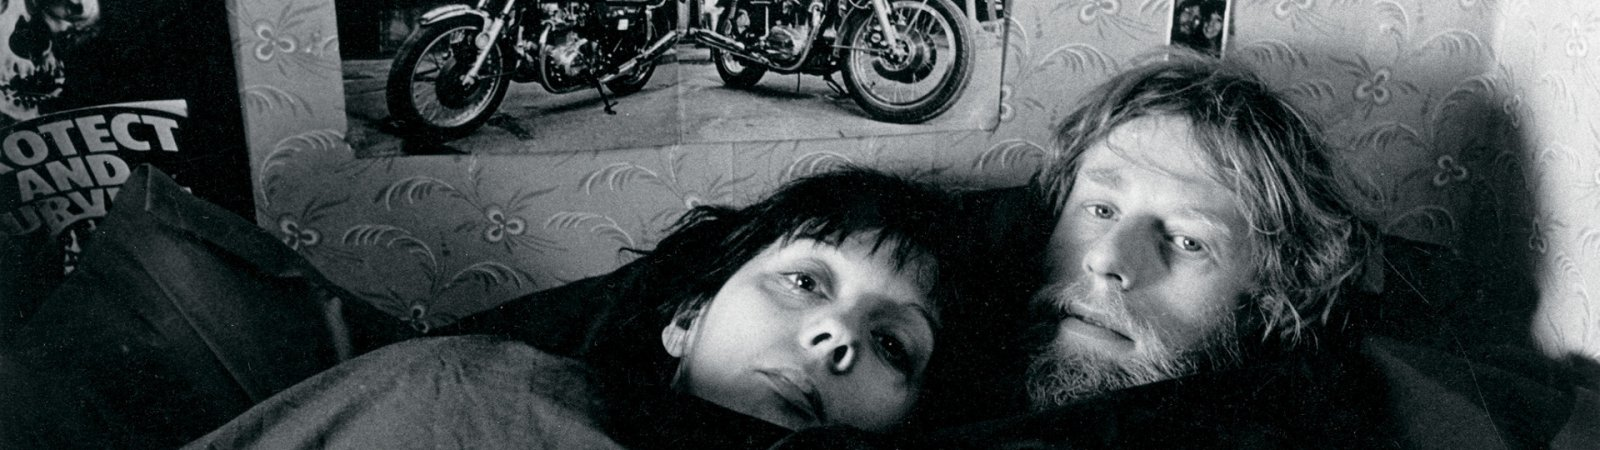 Photo du film : High hopes